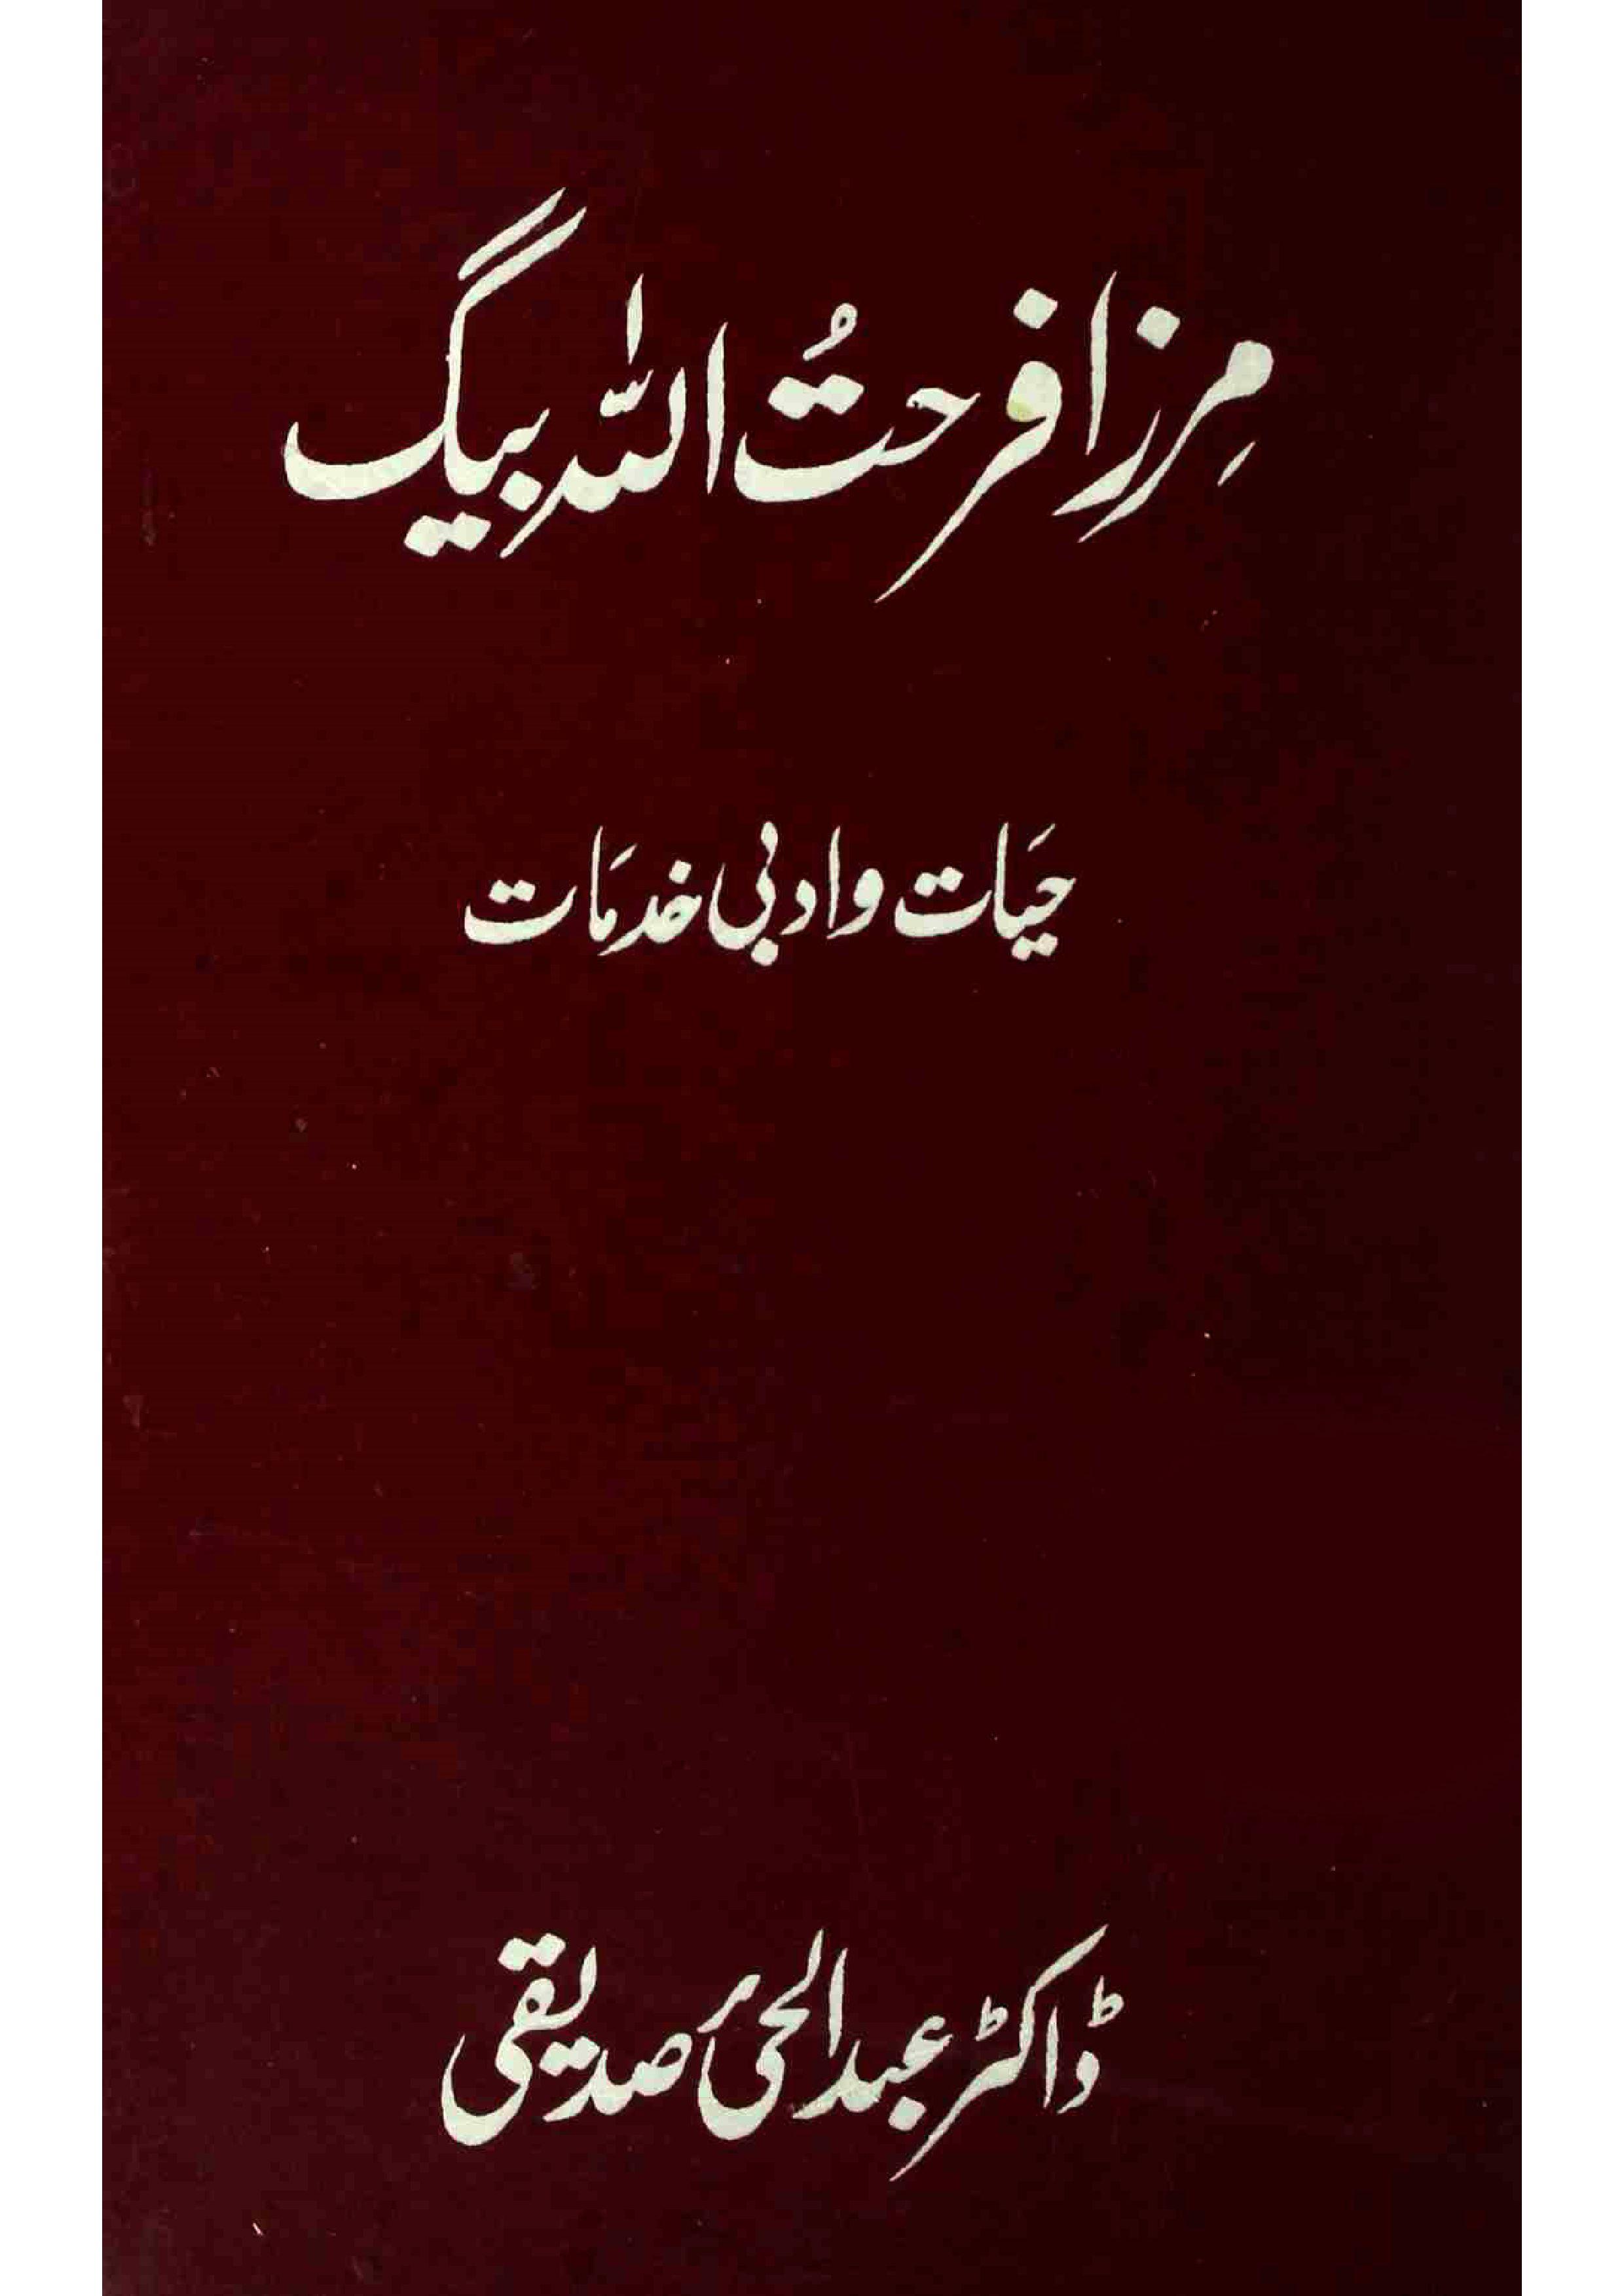 Mirza farhatullah Baig     Hayat-o-Adabi Khidmat